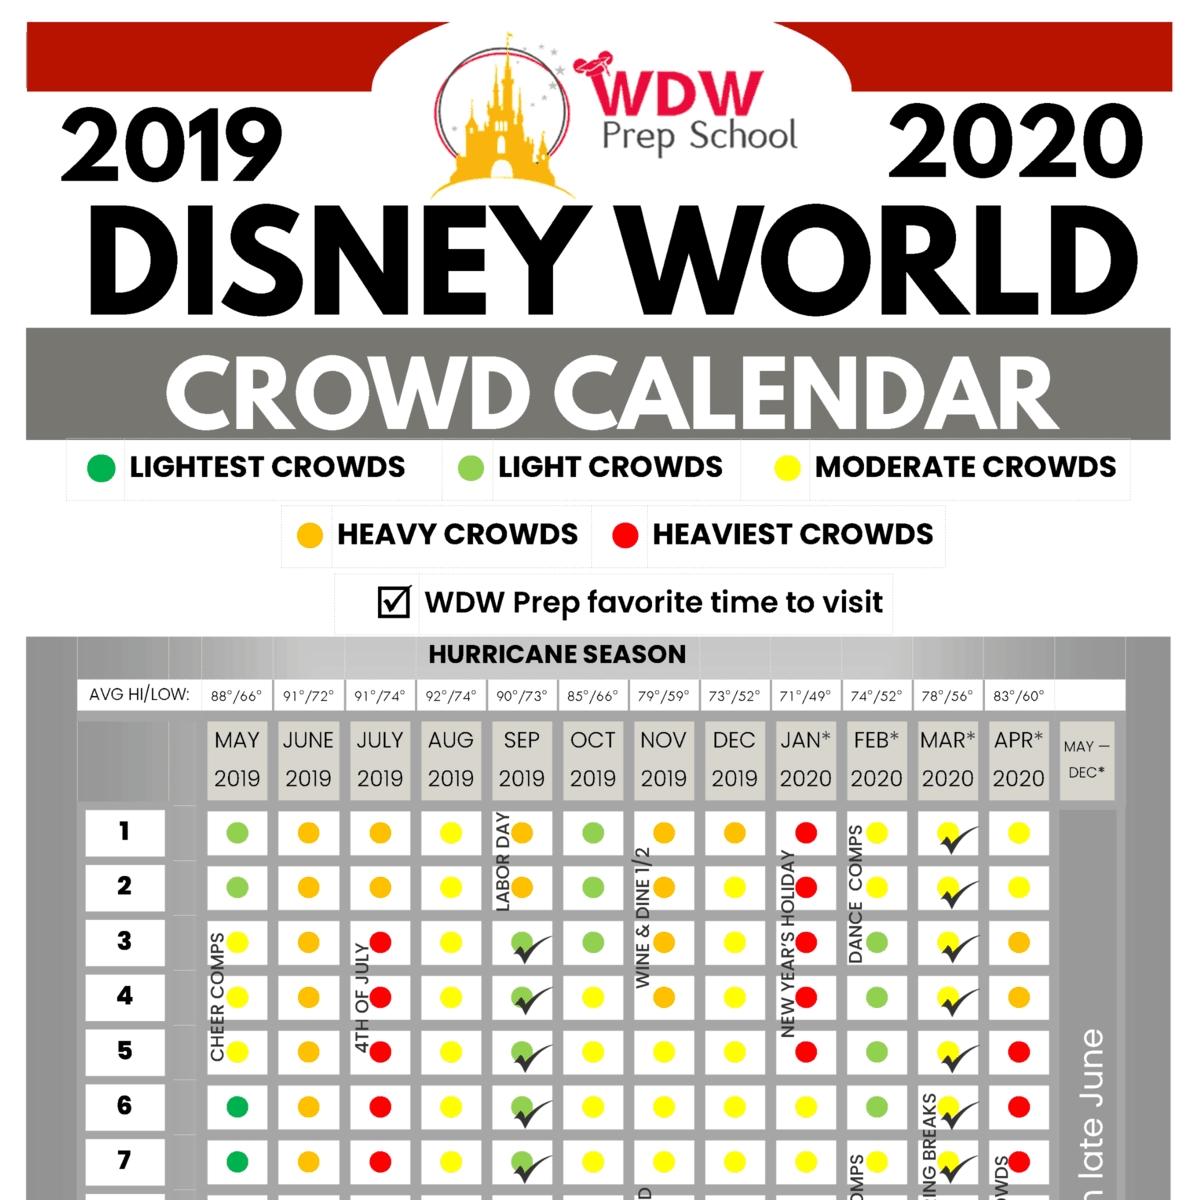 Disney World 2019 & 2020 Crowd Calendar (Best Times To Go-January 2020 Crowd Calendar